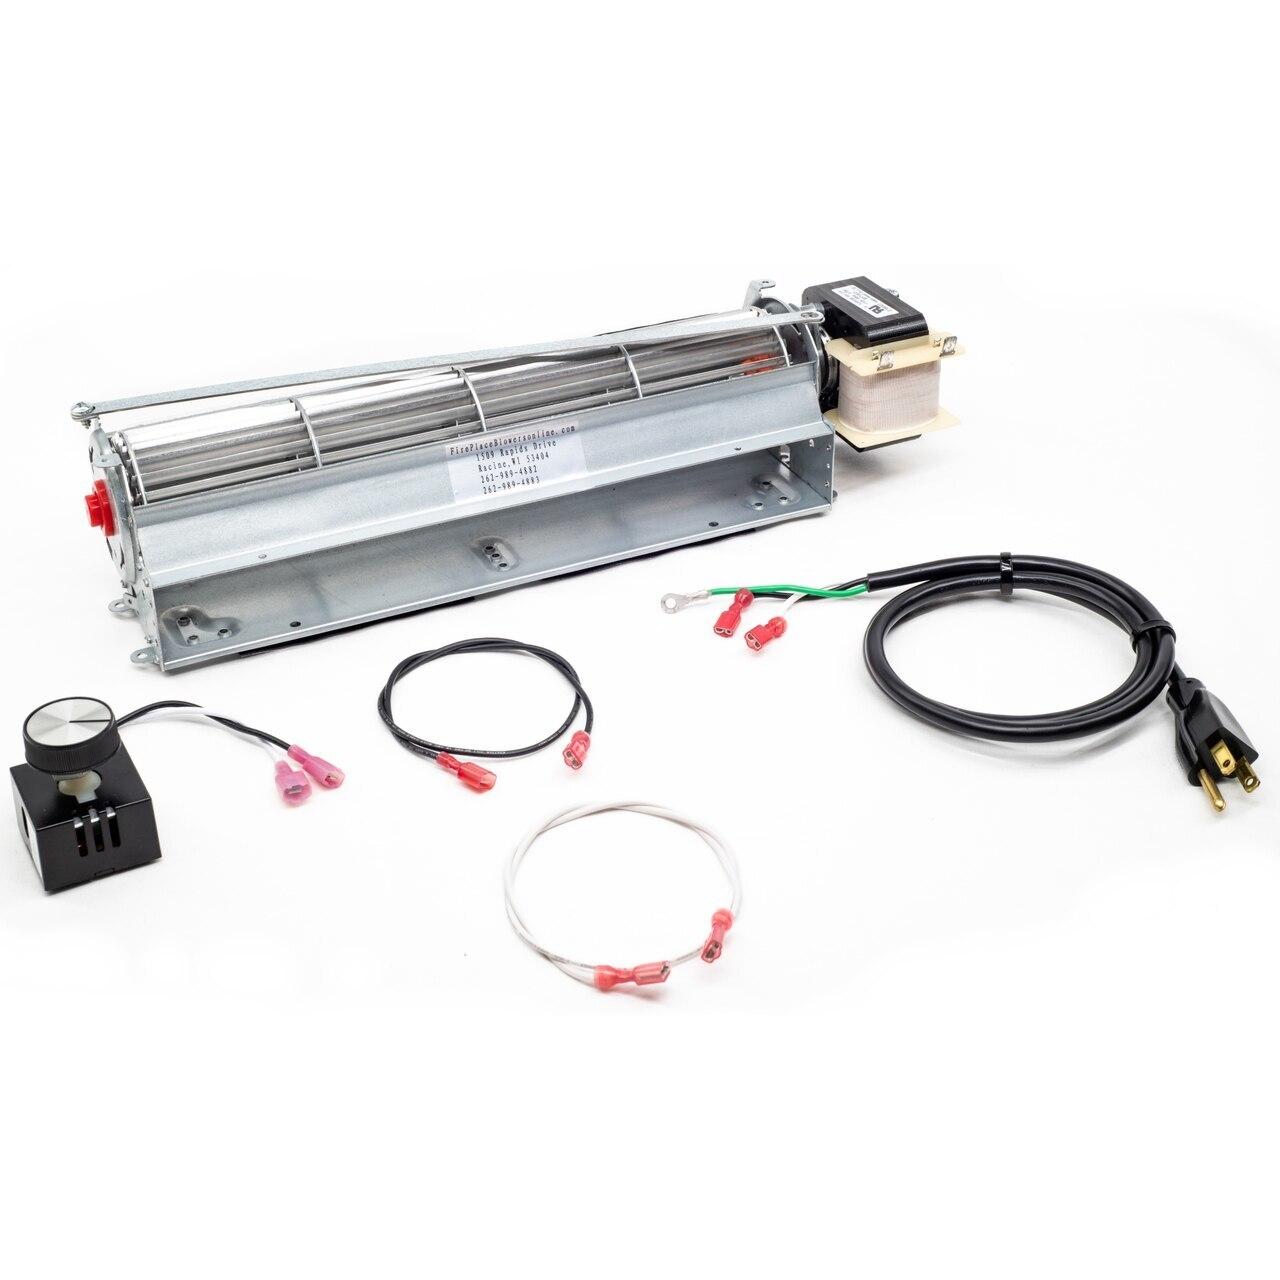 GA3700A Fireplace Blower Kit for Desa, FMI & Vanguard Fireplaces